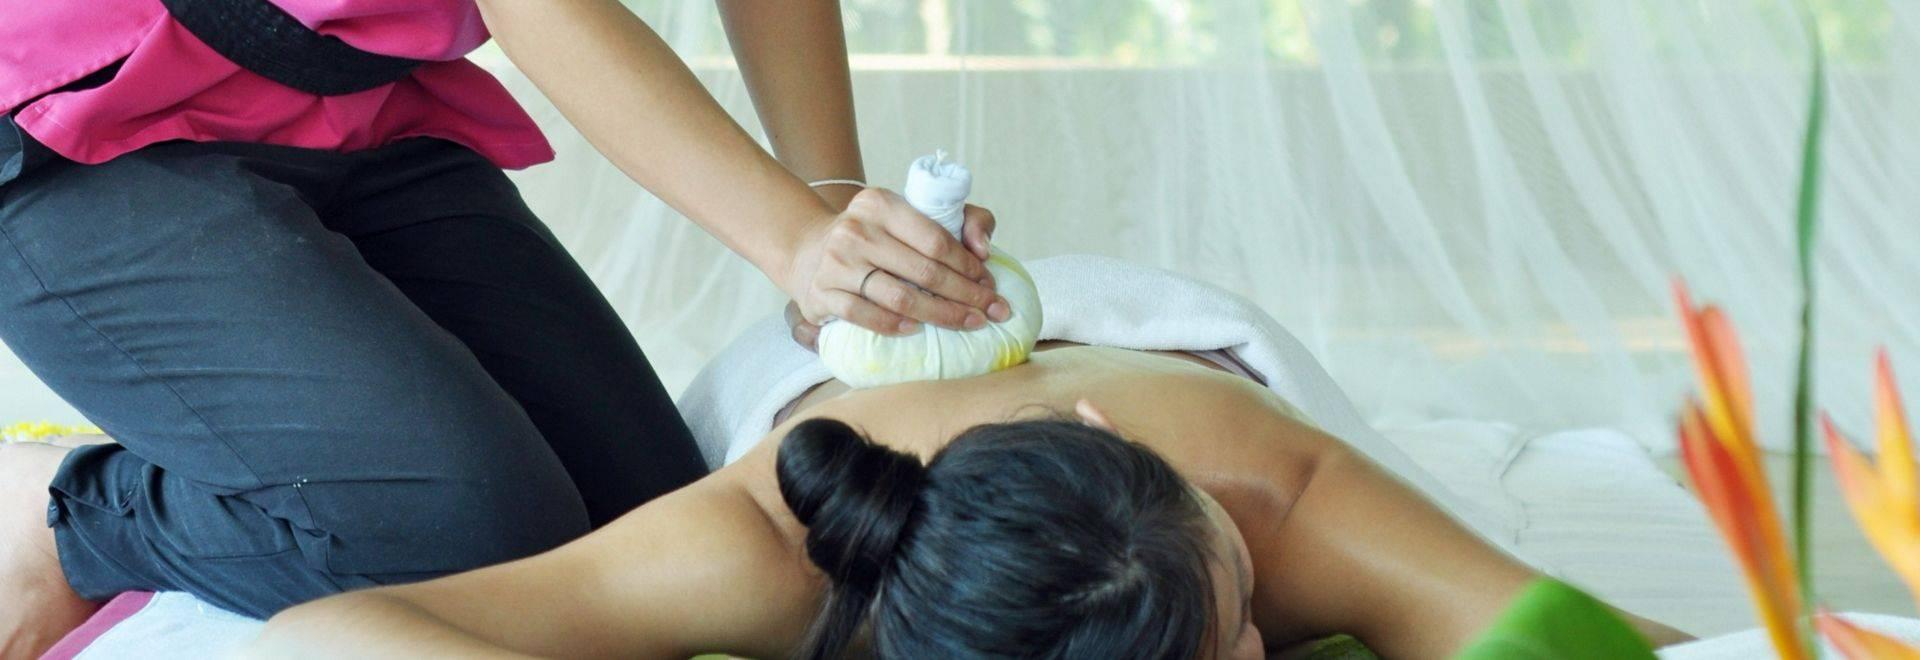 Absolute-Sanctuary-massage-treatment.jpg